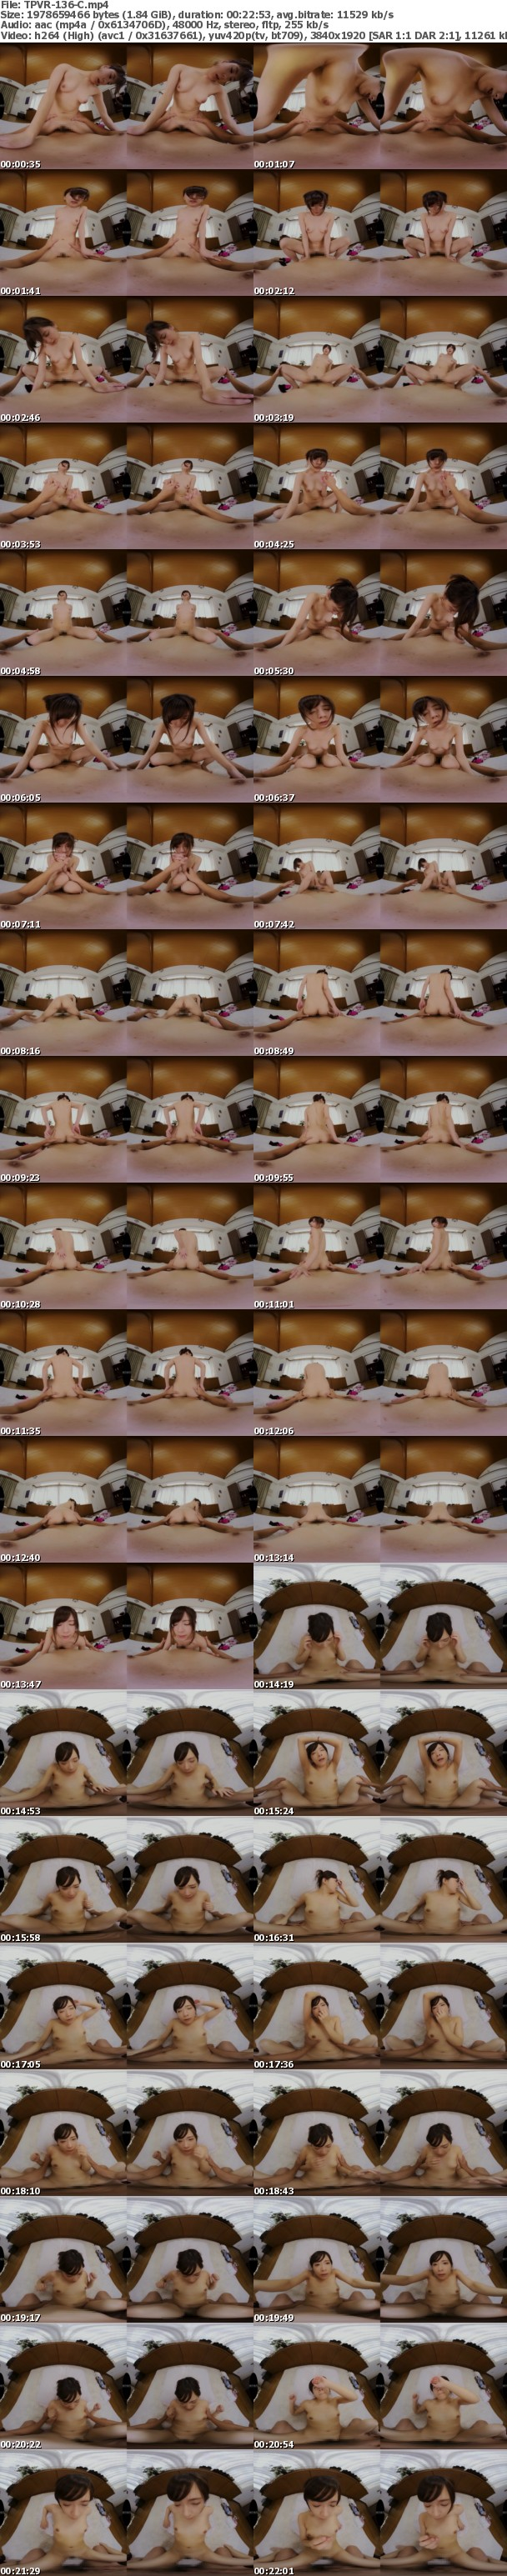 (VR) TPVR-136 ずっとずっと好きだった先輩と私の部屋で…「先輩っ…帰りたいなら私とエッチしなきゃですよっ!」